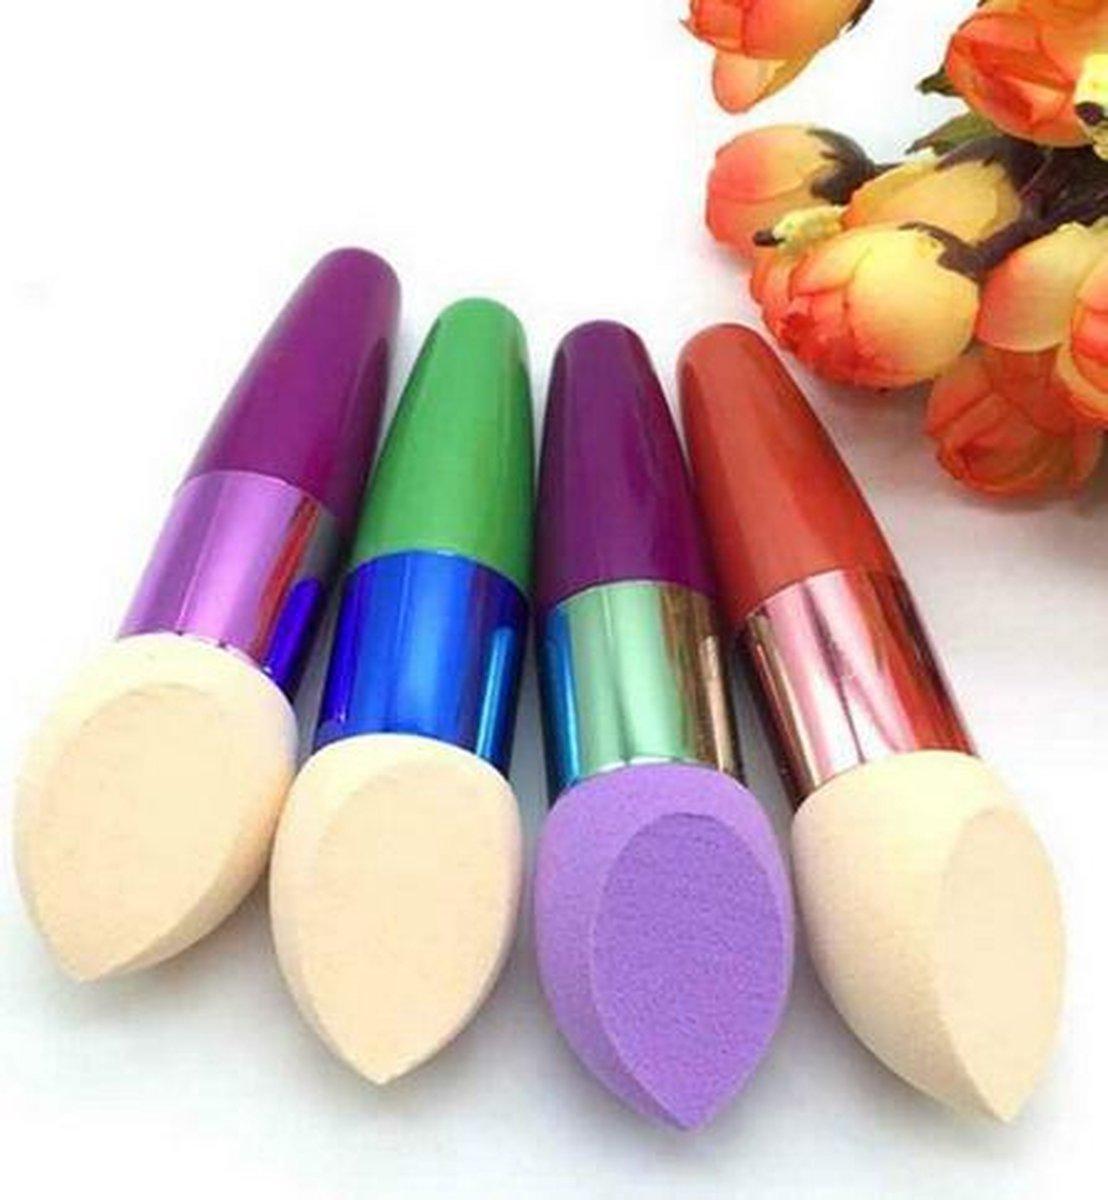 Beauty make-up spons pen makeup Egg shape voor blending foundation / HaverCo - HaverCo